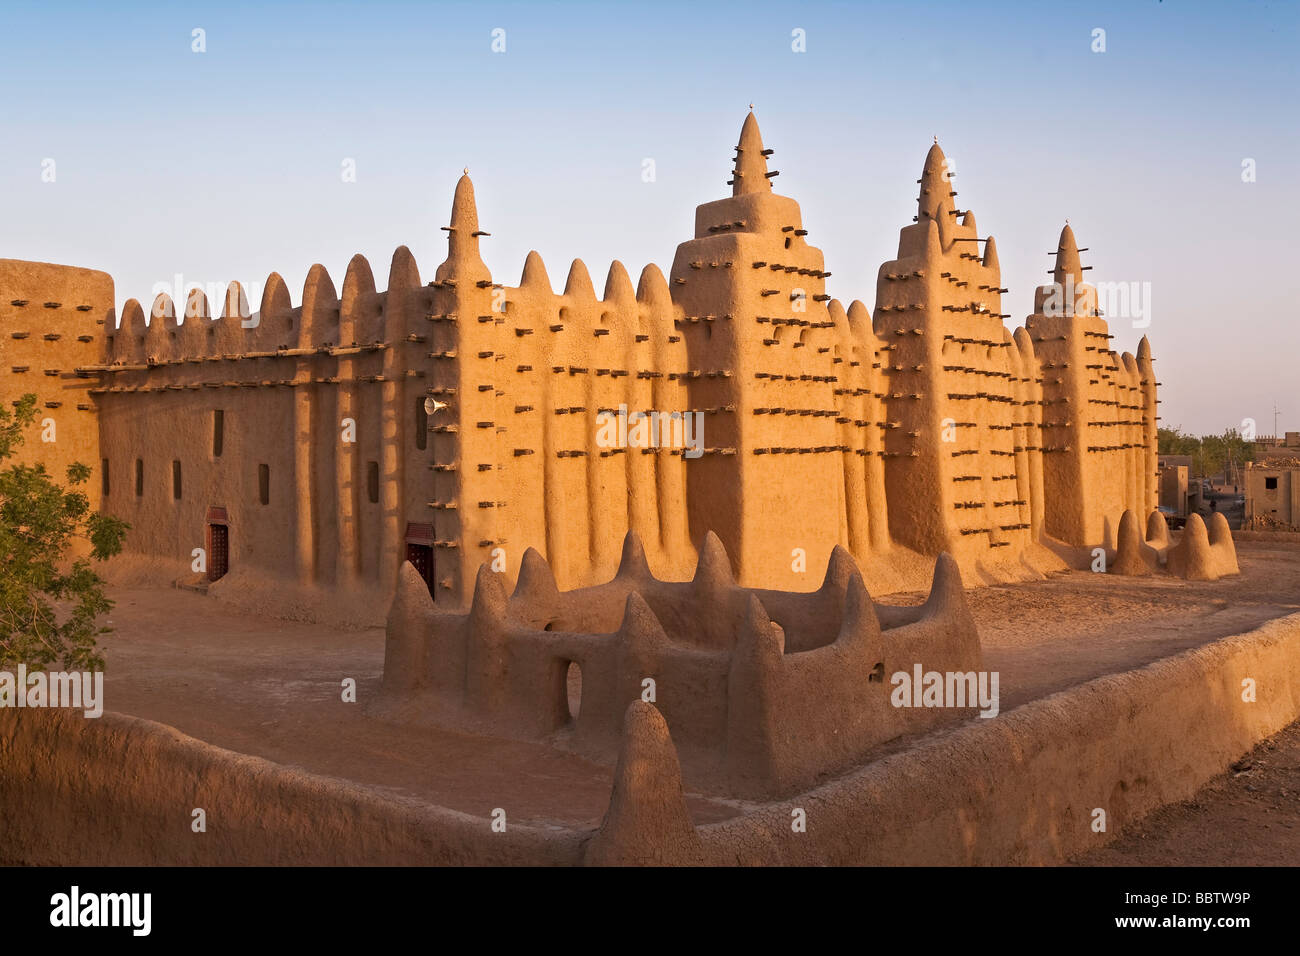 Grande Moschea di Djenne, Djenne, Mopti regione, Niger Inland Delta, Mali, Africa occidentale Immagini Stock